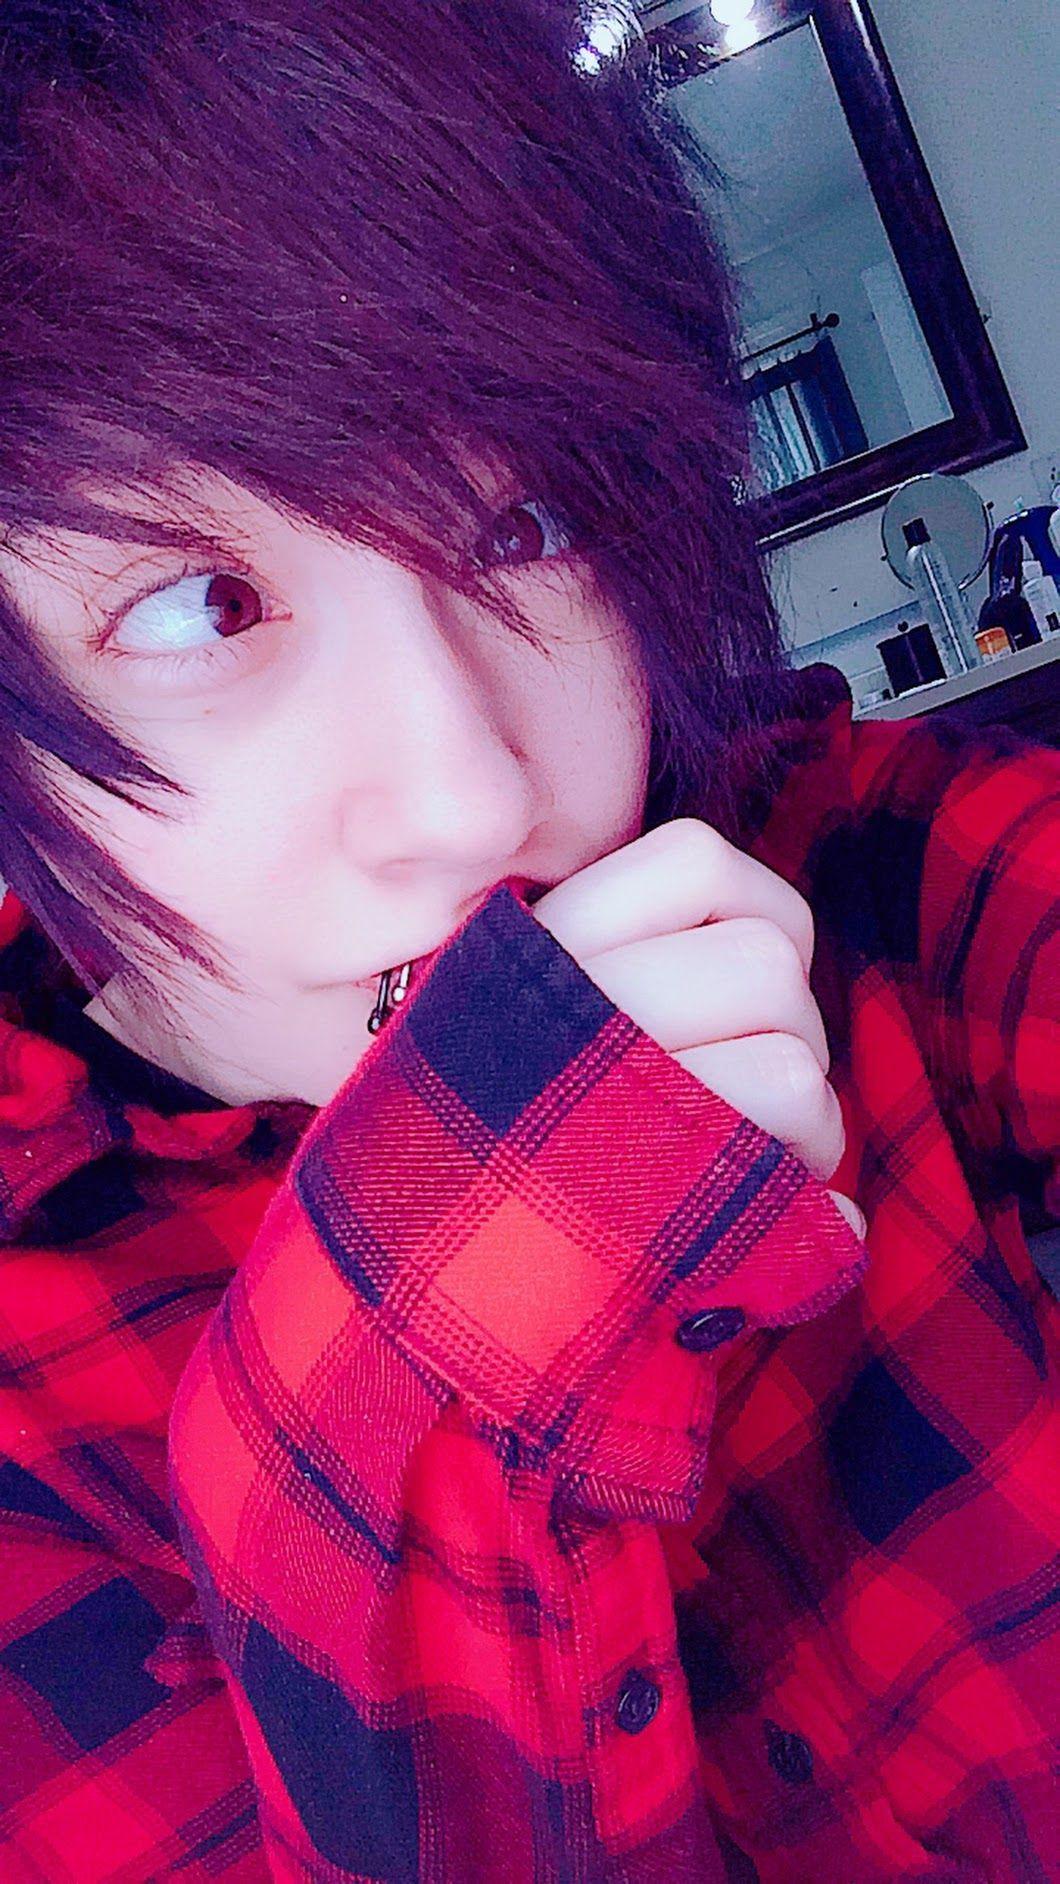 Pin by ihany on animes pinterest emo boys cute emo and cute emo